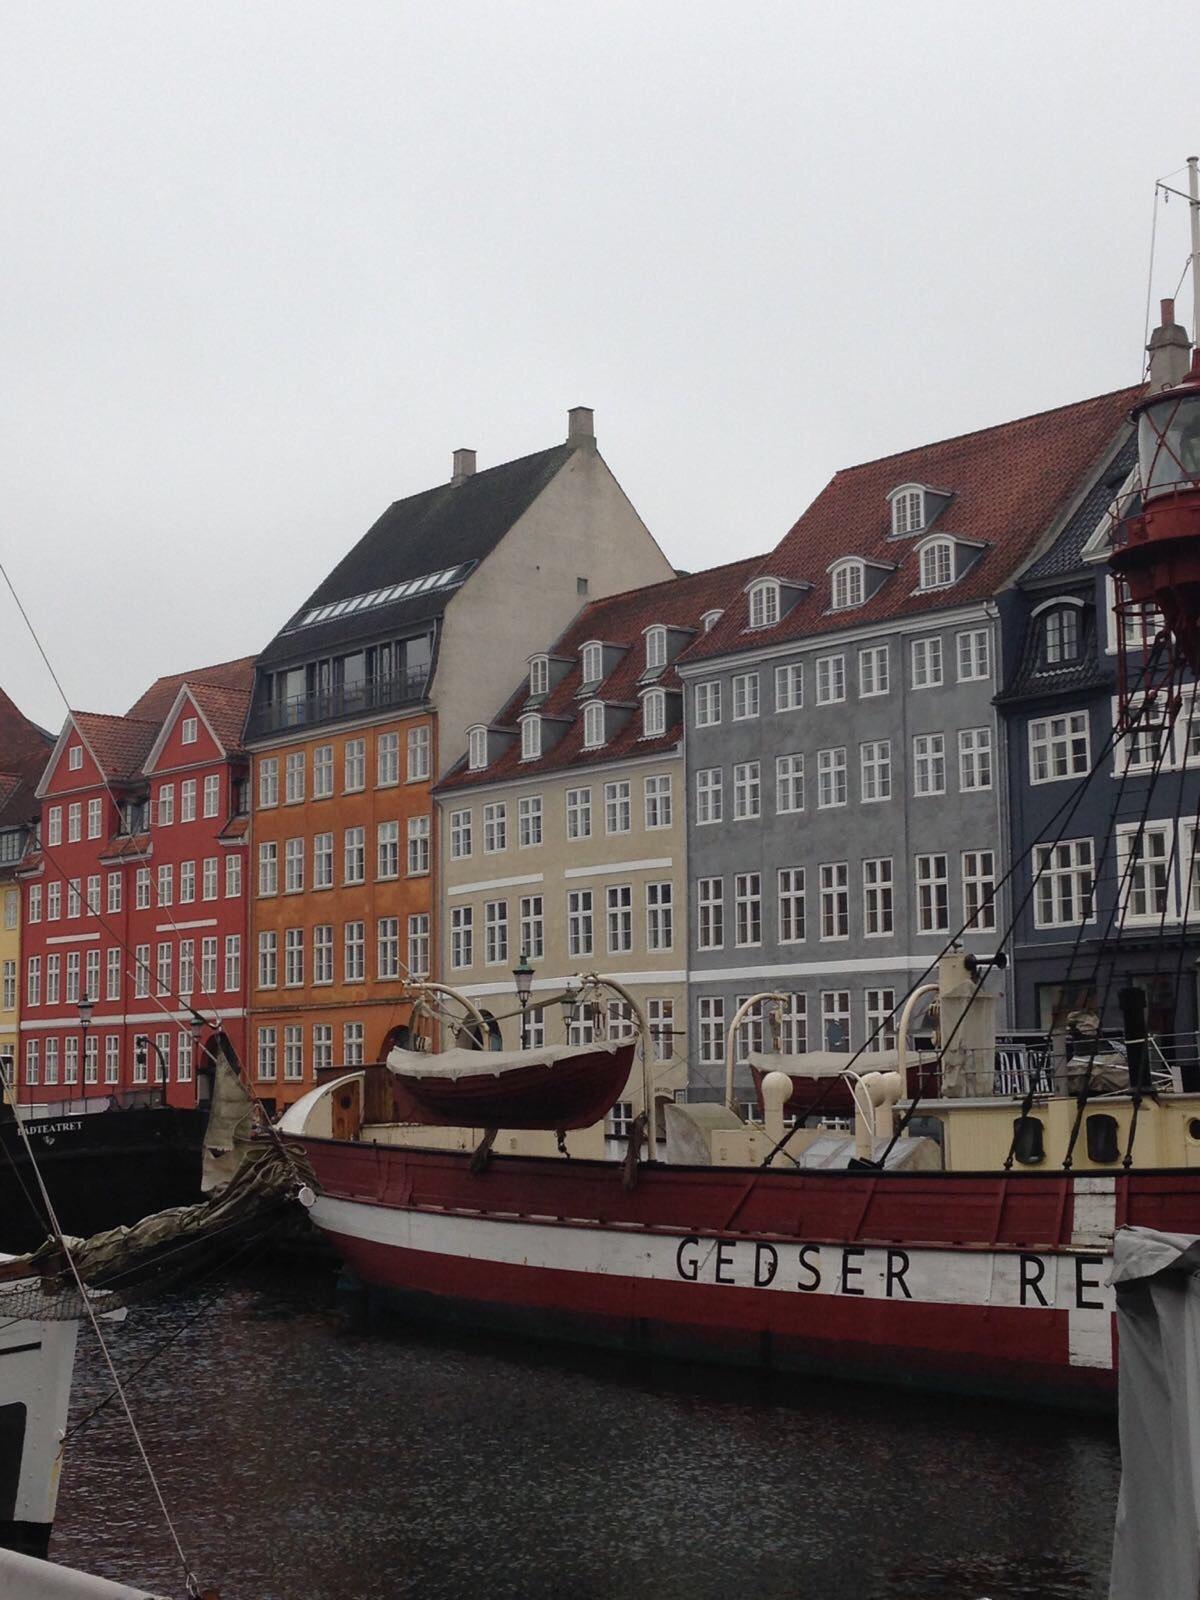 Copenhagen, Nyhavn, but the river - colourful houses